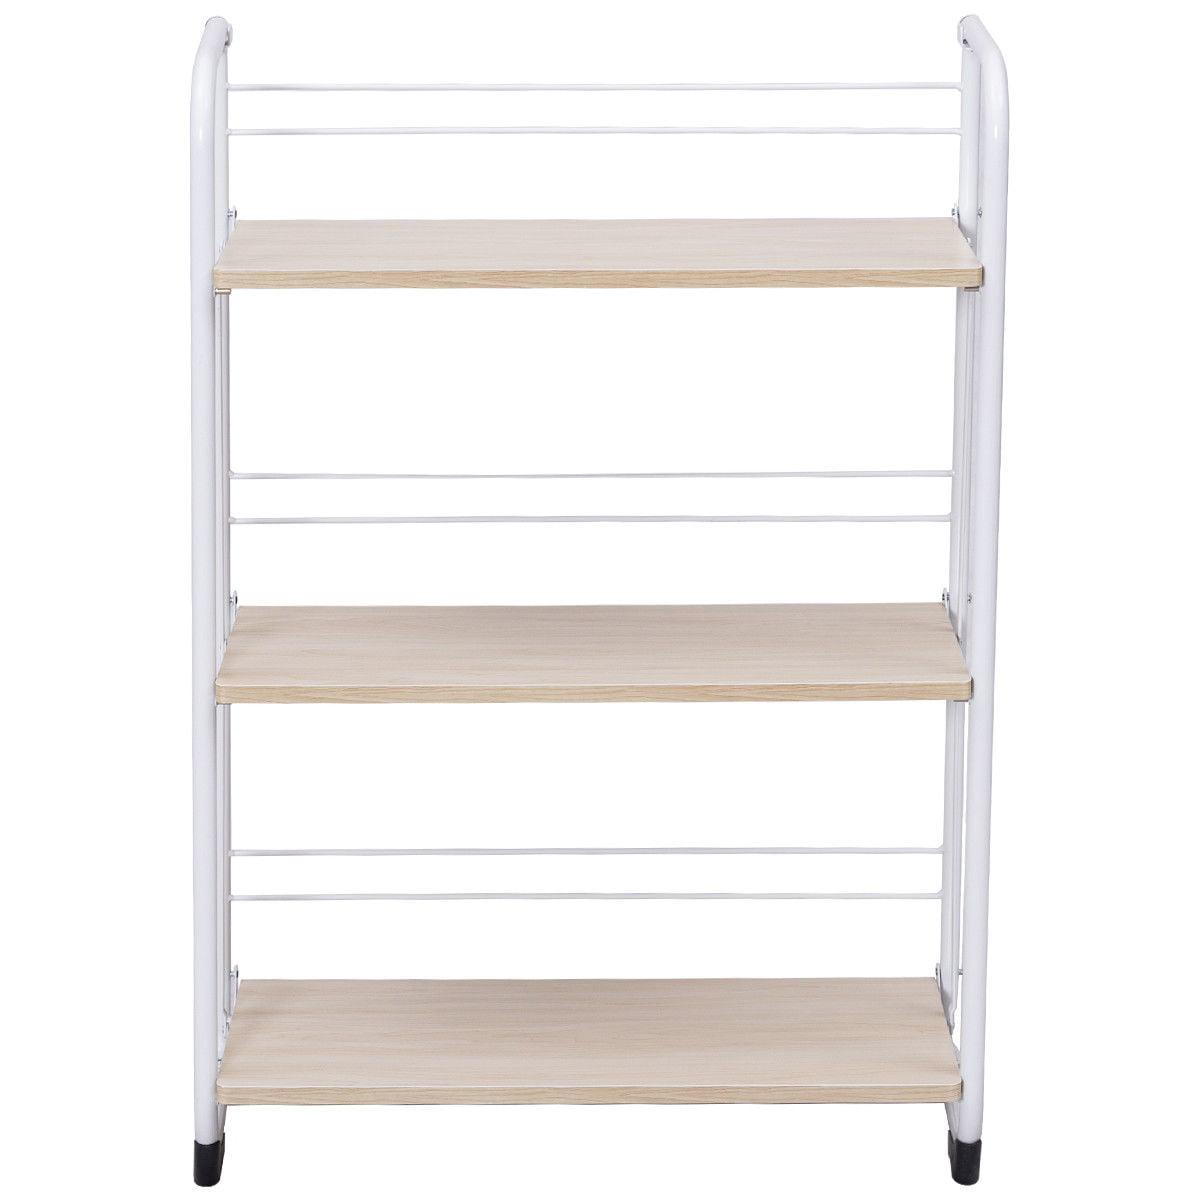 Gymax Folding 3 Tier Shelves Organization Storage Utility Shelving Unit Standing Rack - image 2 of 10